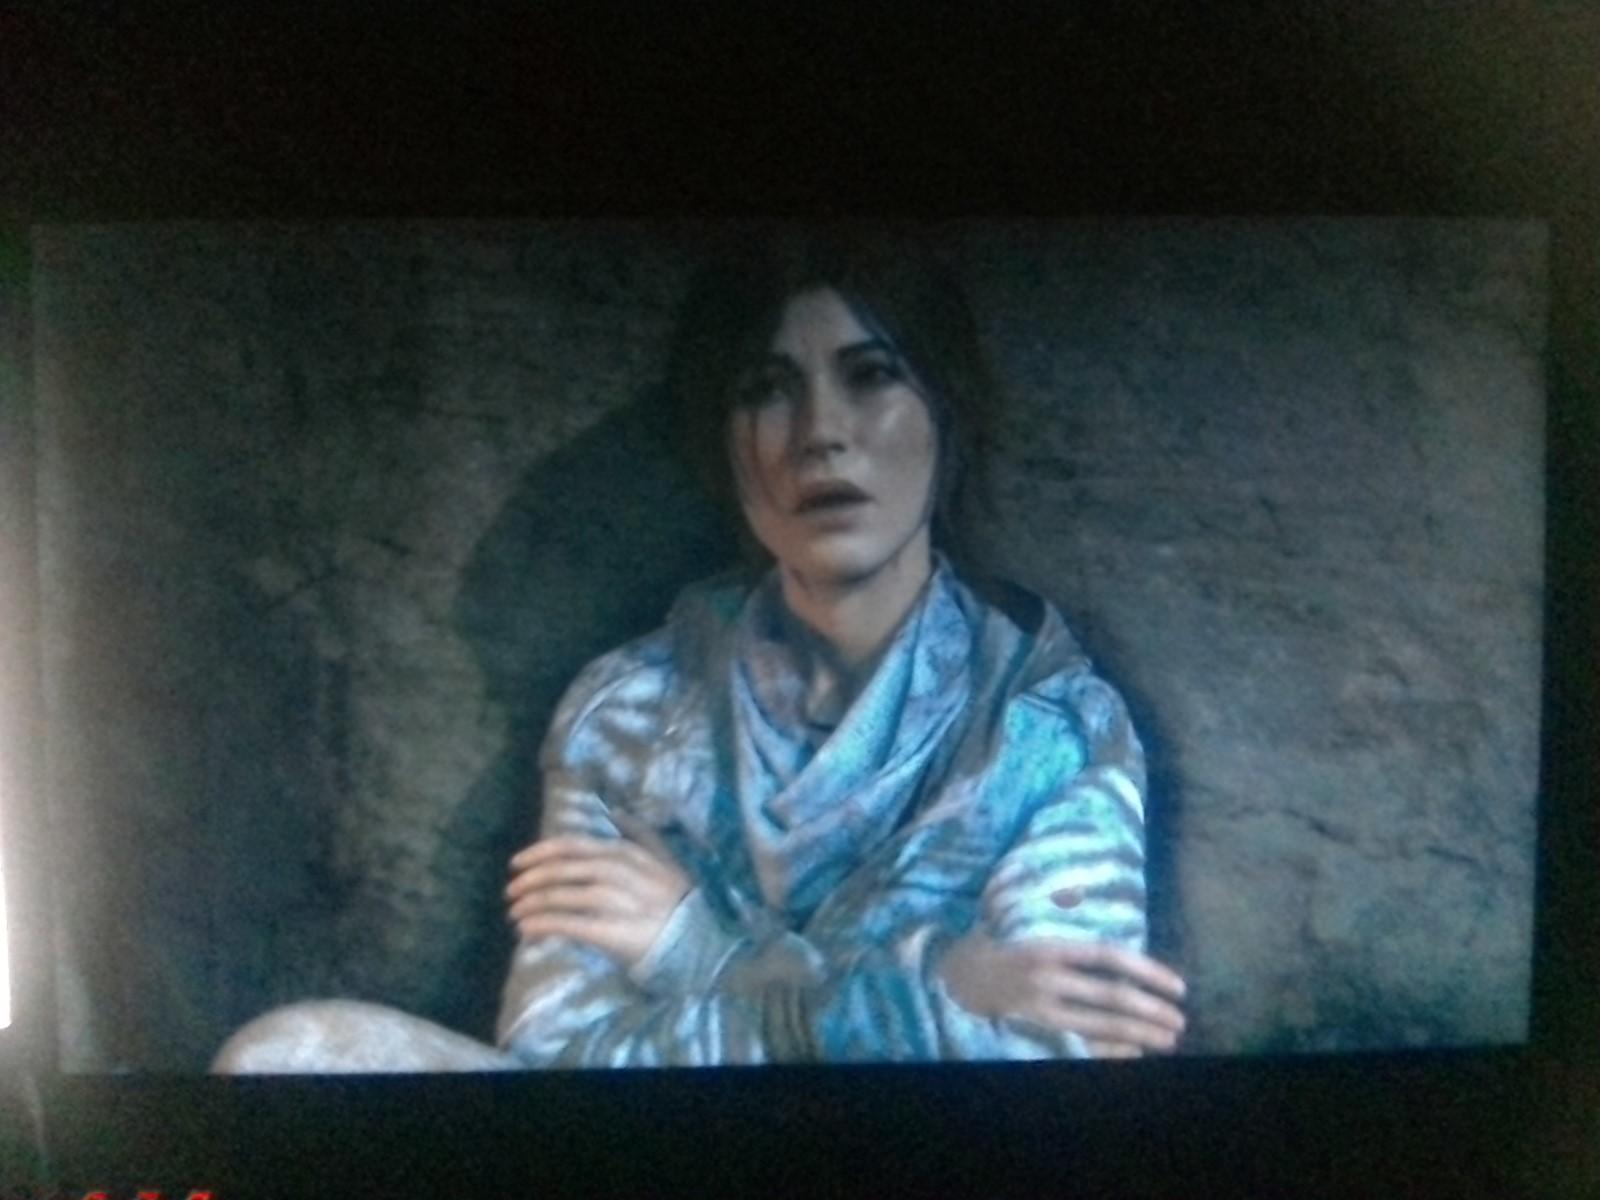 Testbild 2 - Lara Croft